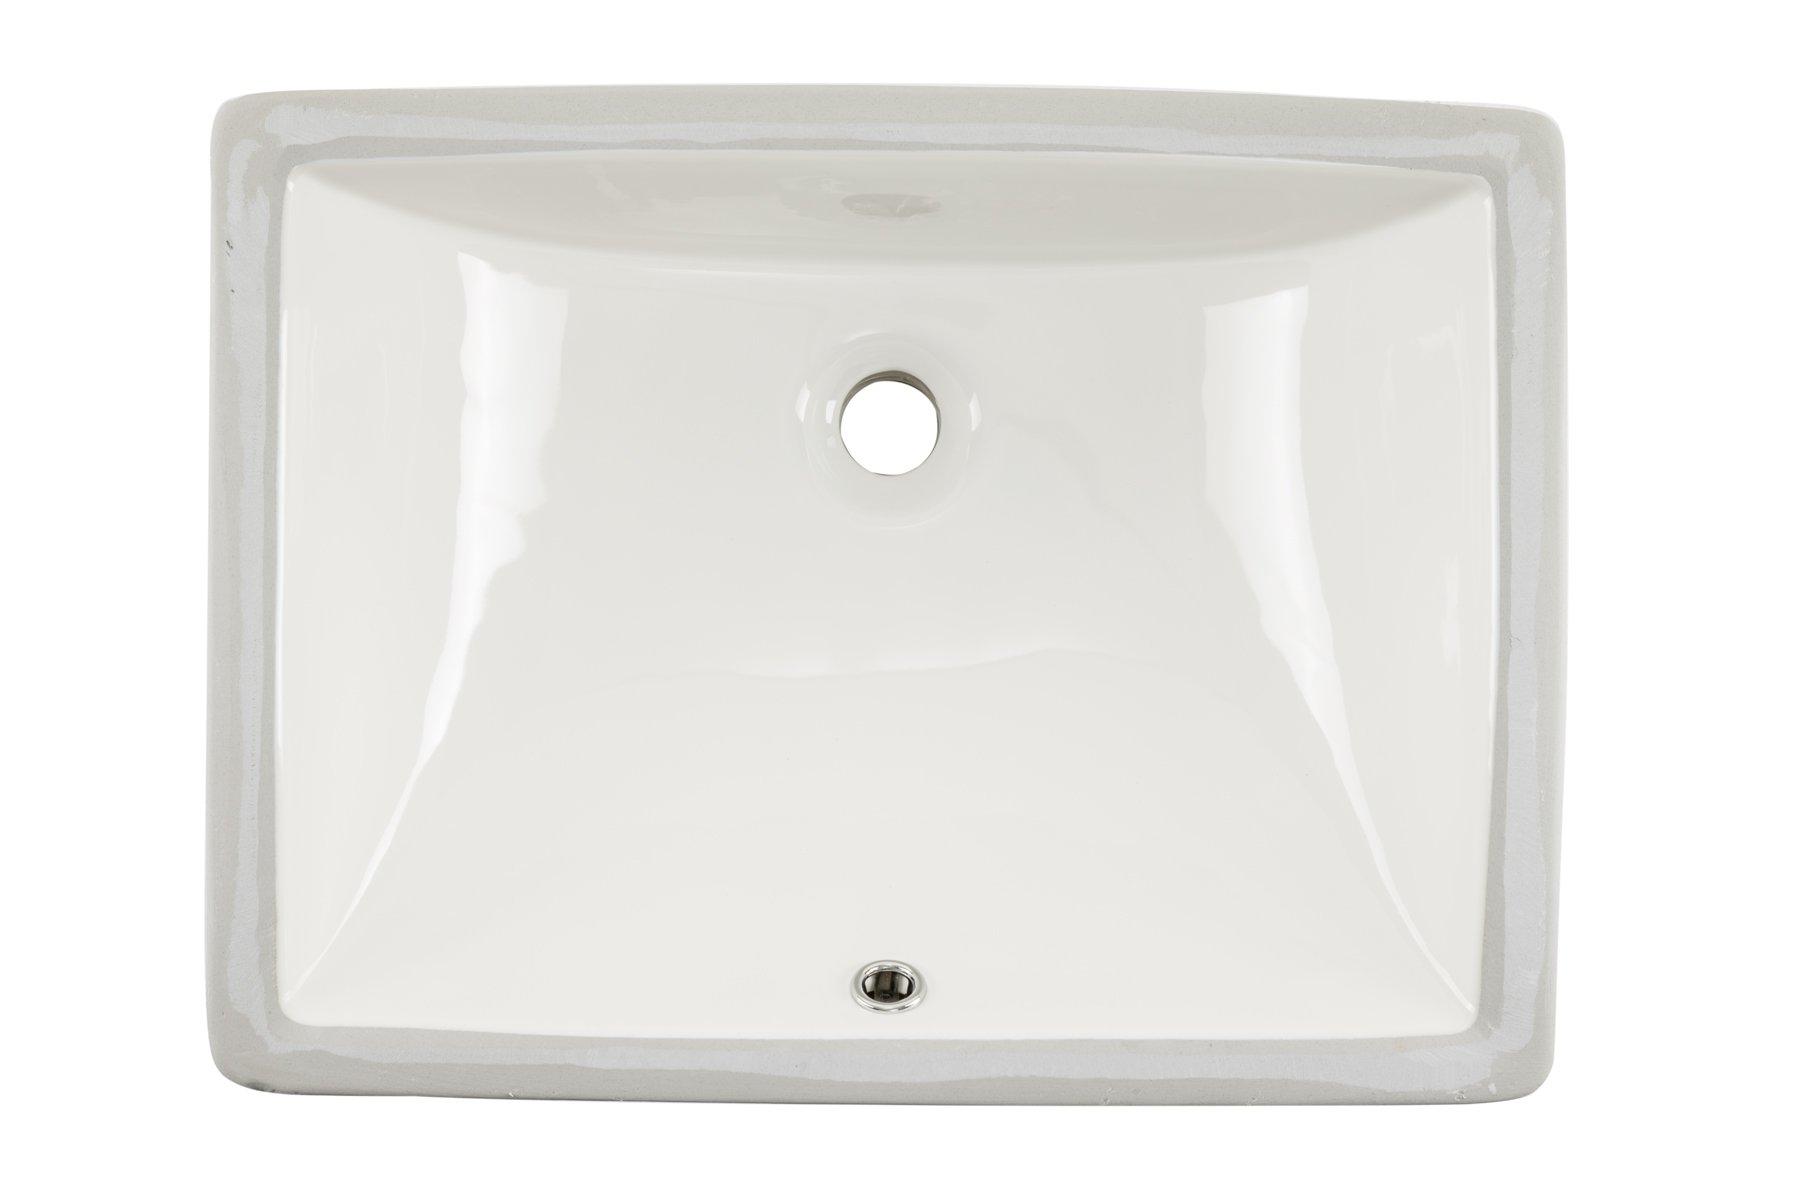 1813CBB 18'' x 13'' Bisque Rectangular Porcelain Undermount Lavatory Bathroom Sink by Magnus Sinks